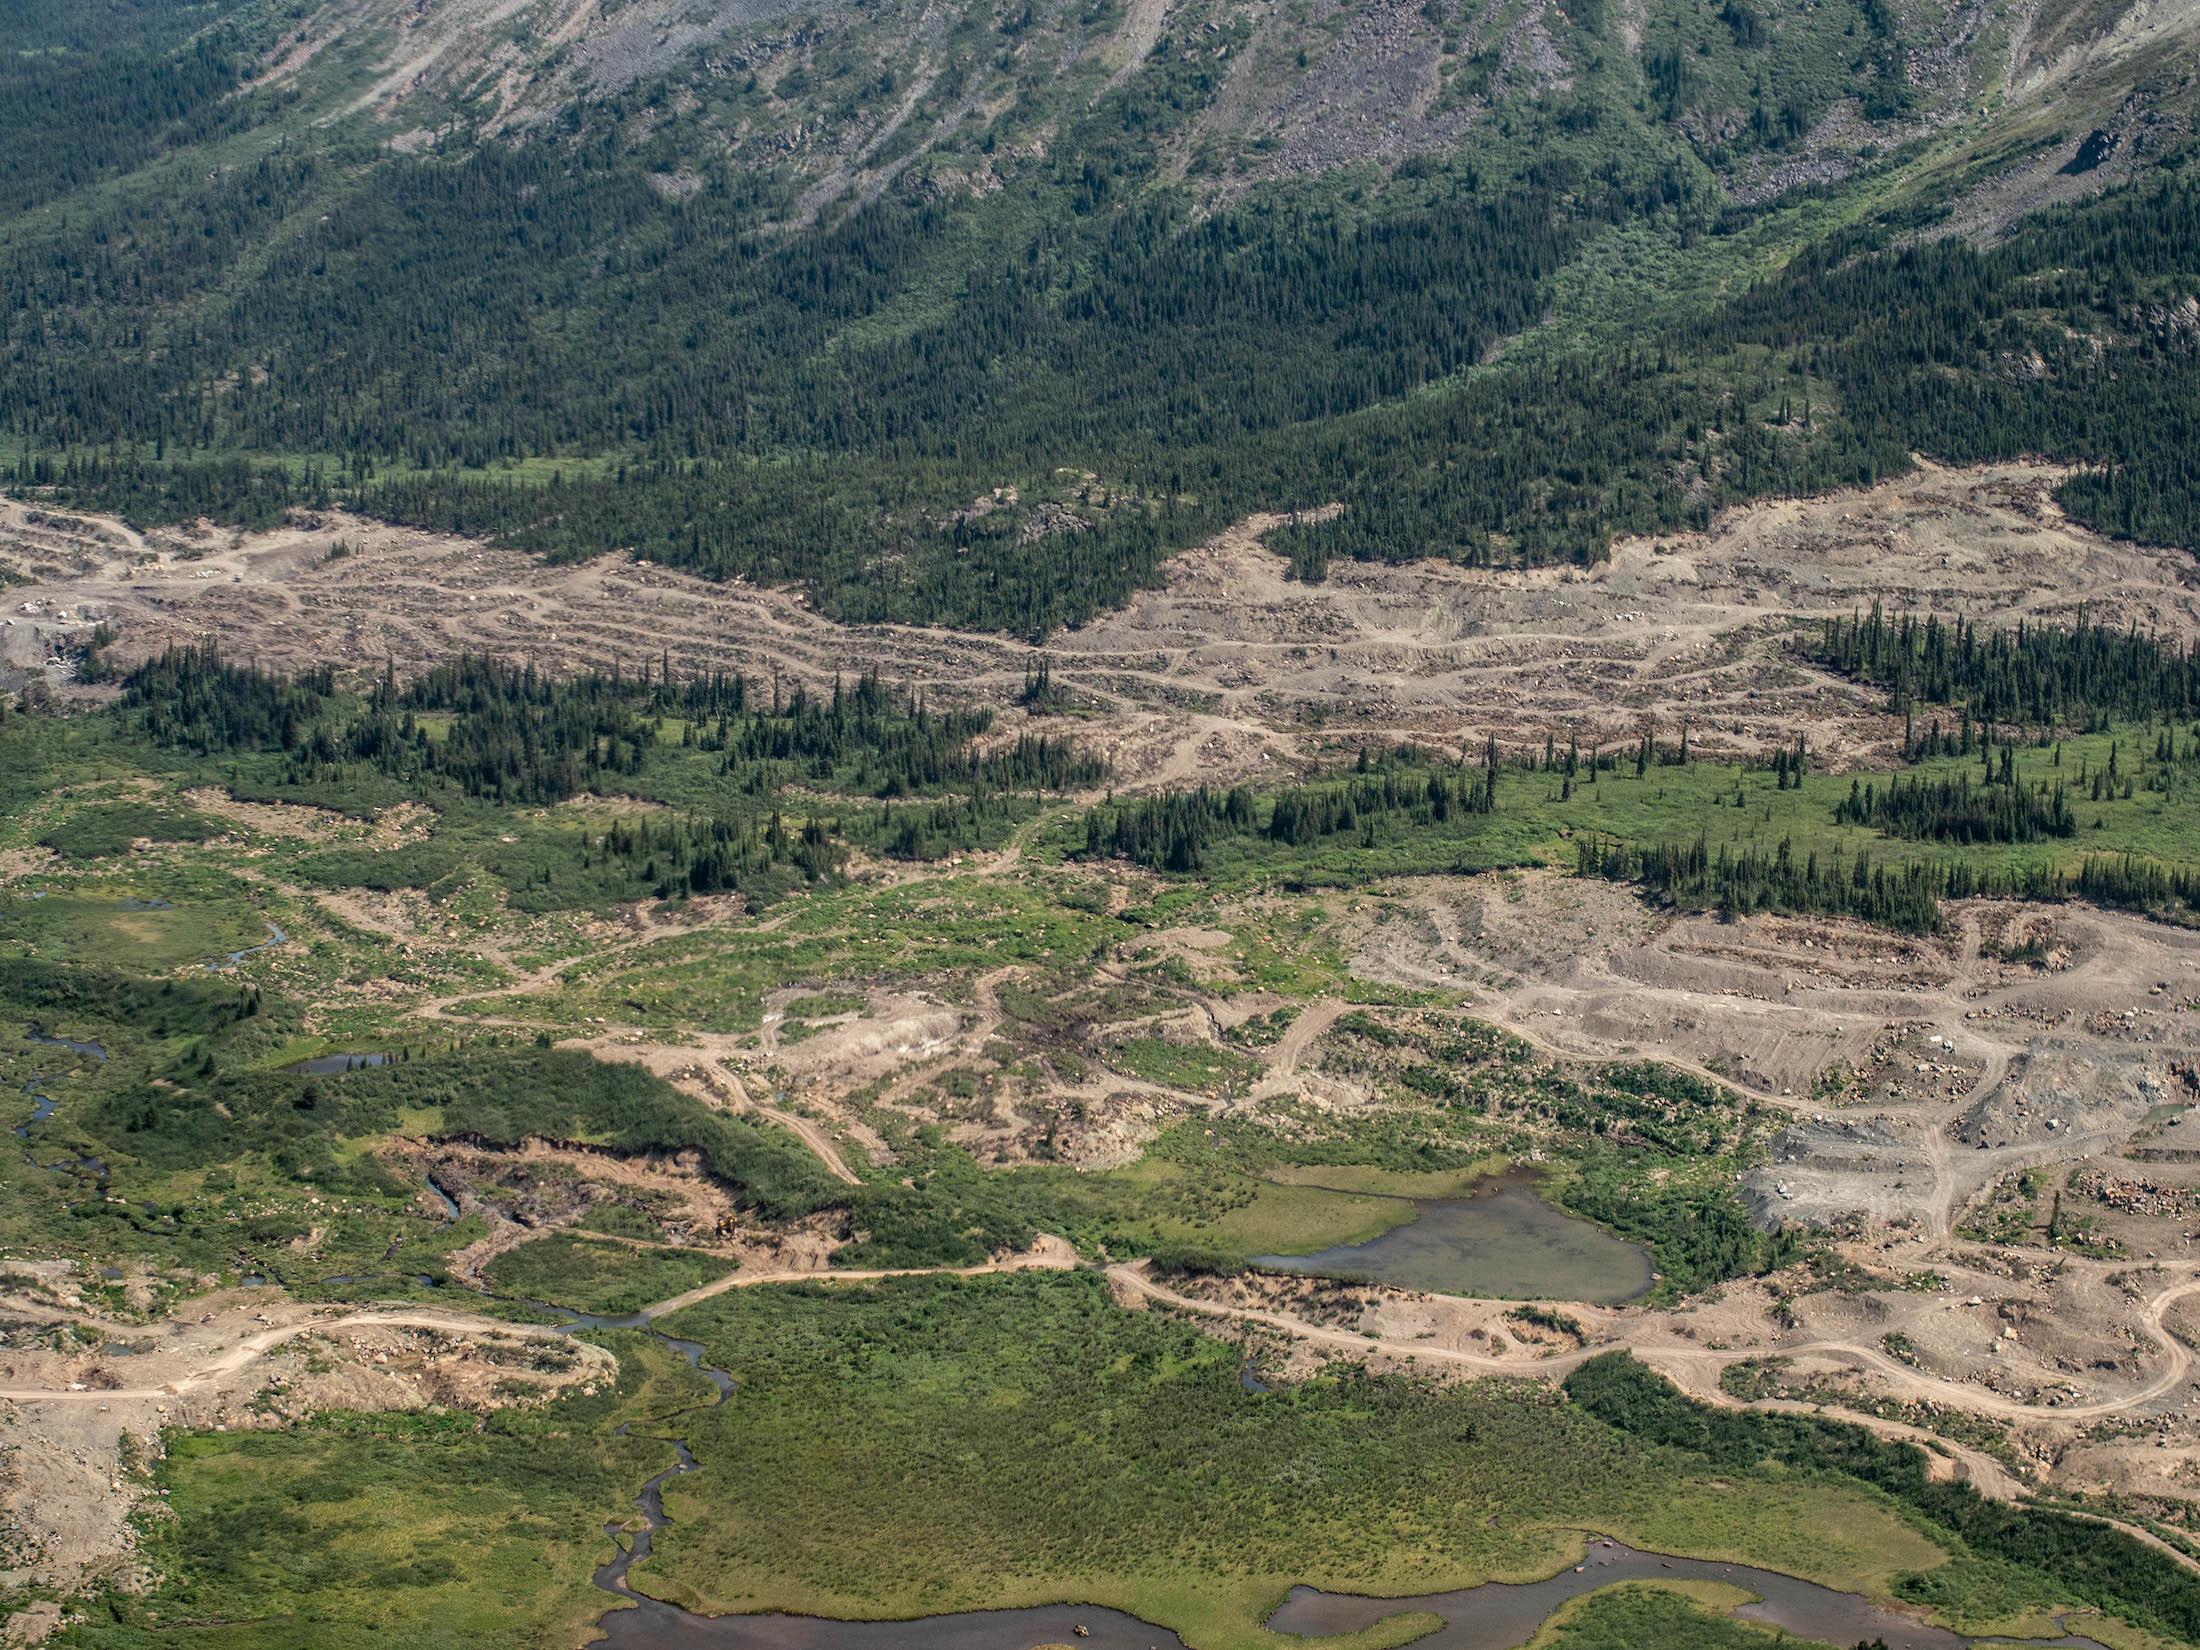 Jade placer mining Tahltan territory